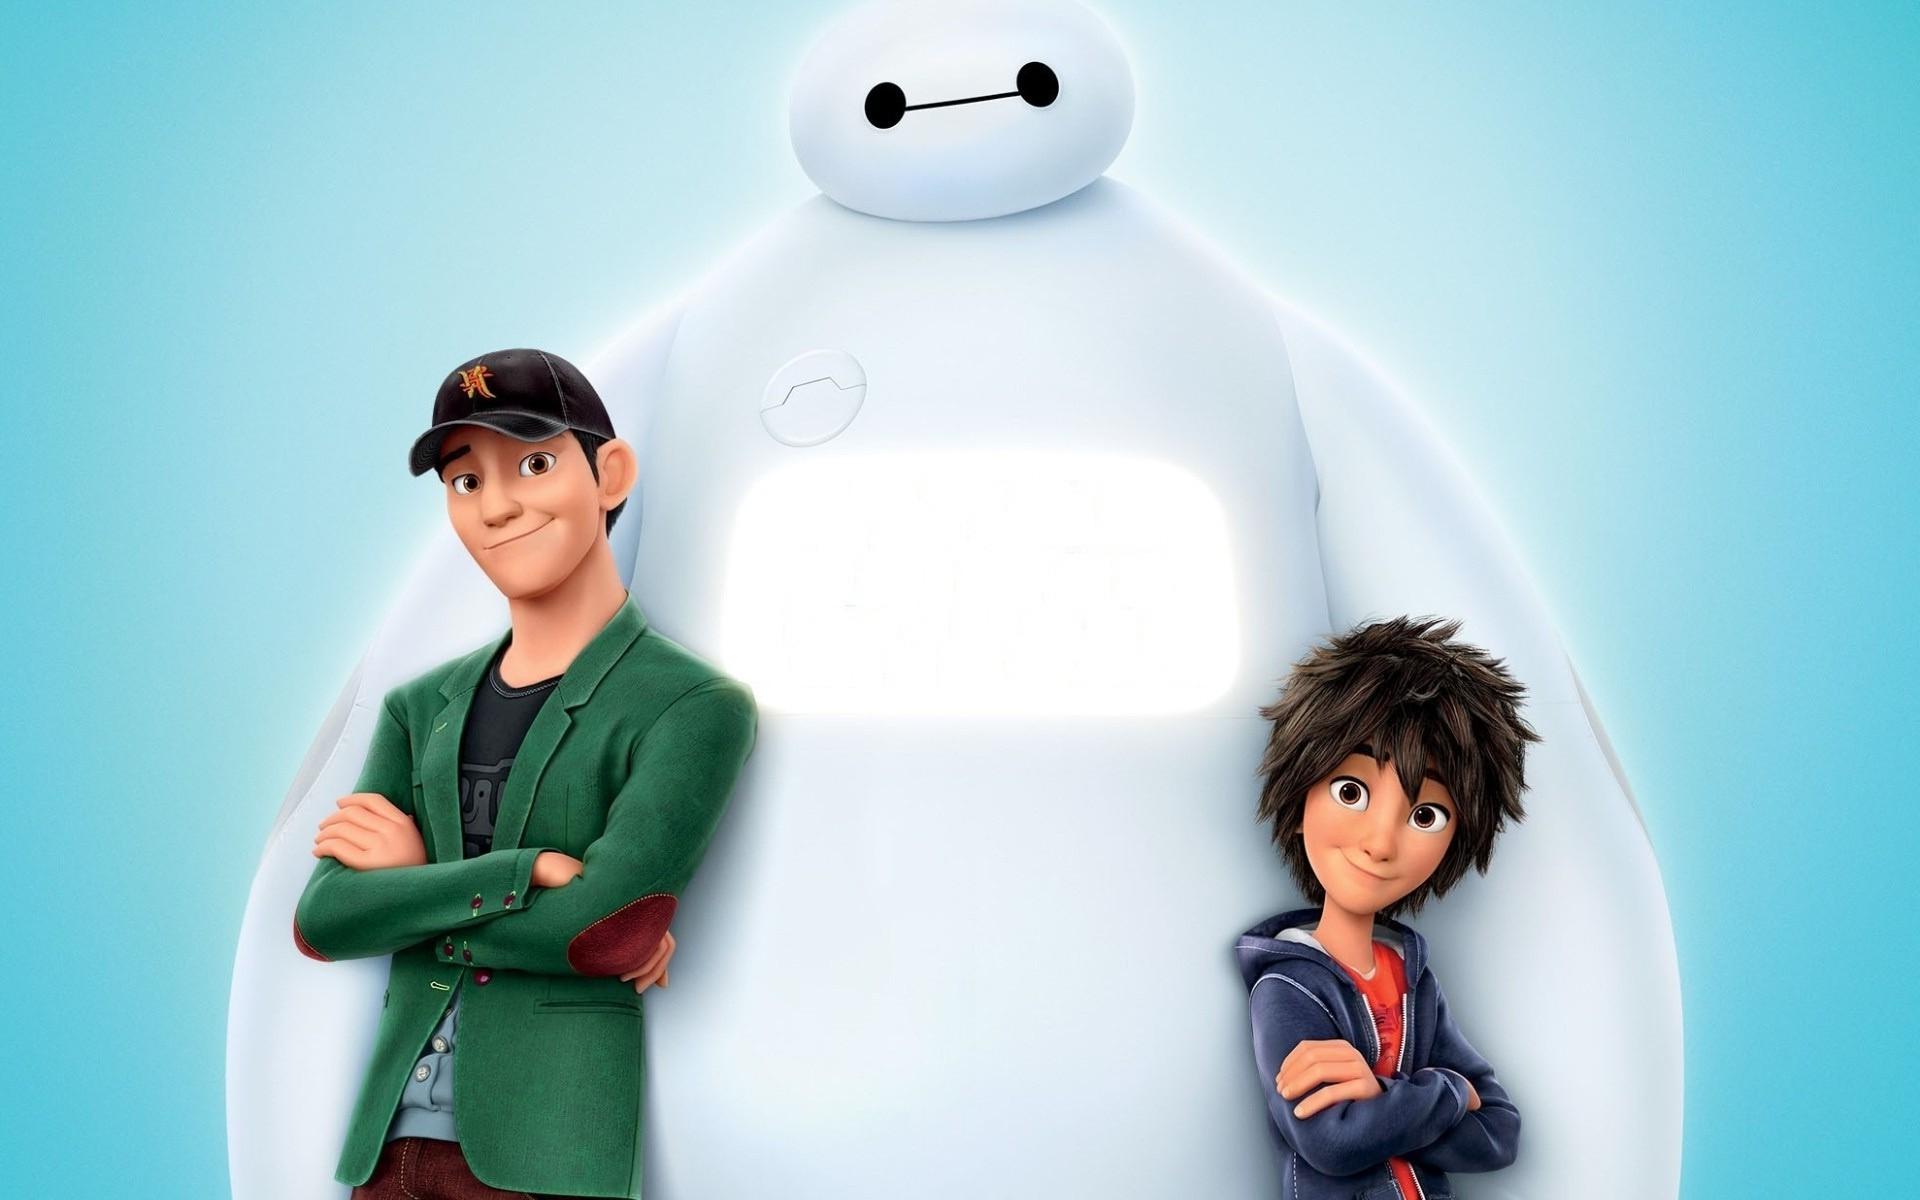 Illustration Baymax Big Hero 6 Animated Movies Disney Person Play Hiro Hamada